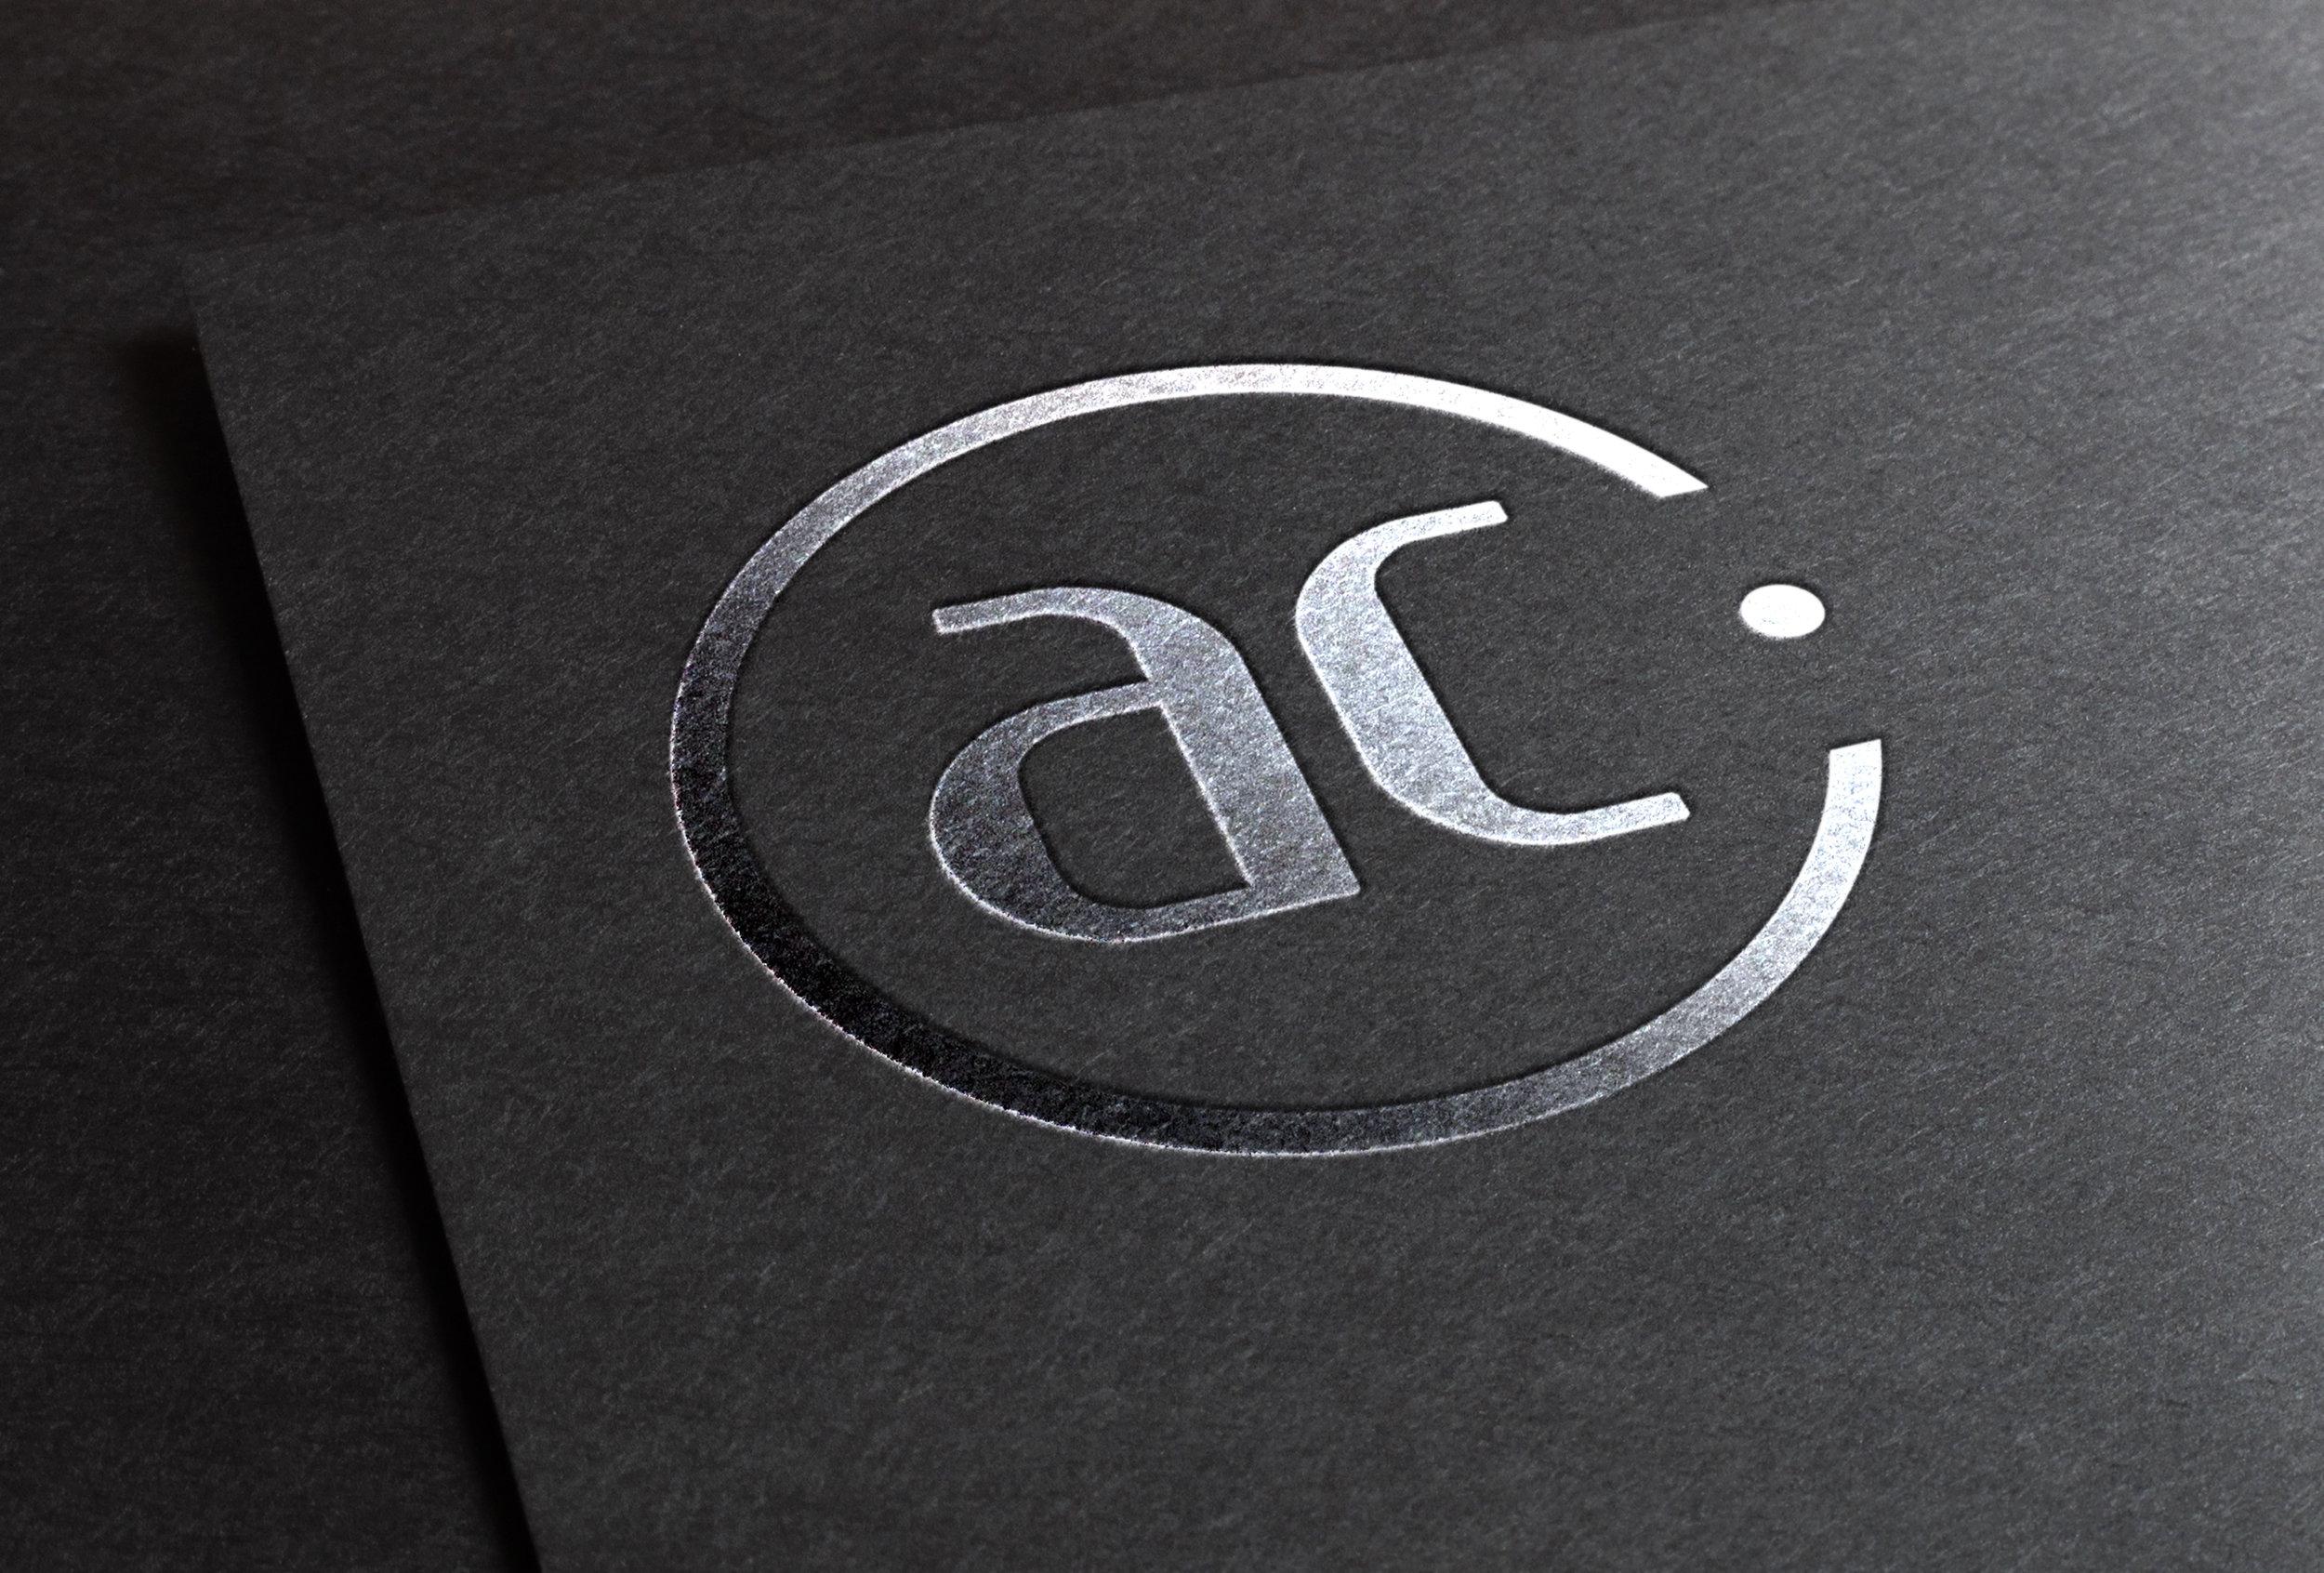 Ac2b.jpg